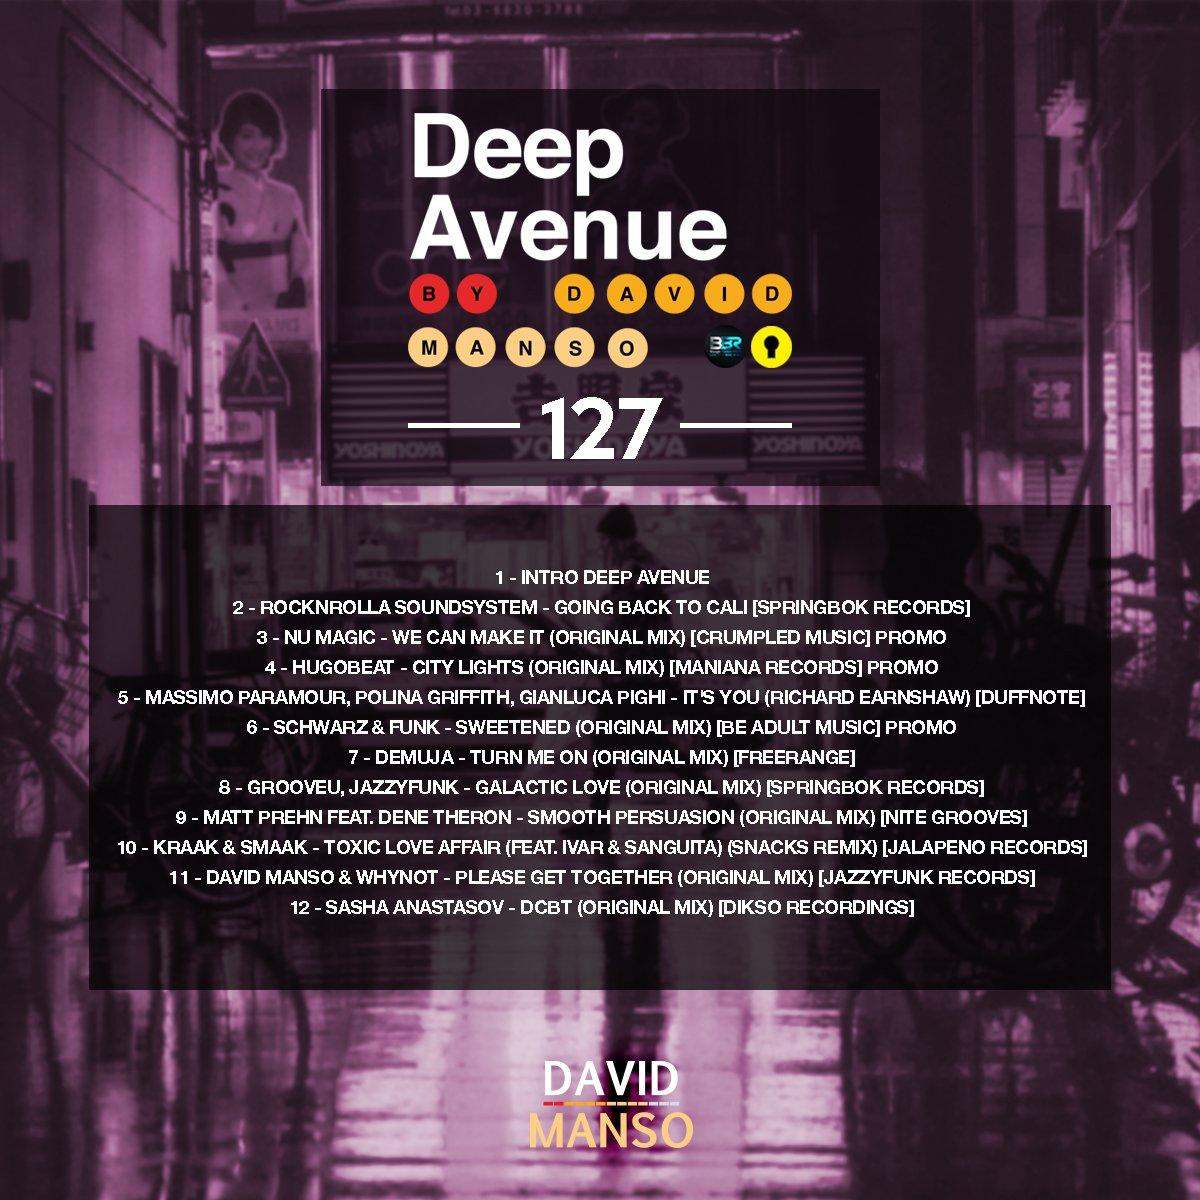 New Deep Avenue, release 127 #deephouse #nudisco #disco premiered on @BoogieBunkerBBR<br>http://pic.twitter.com/Oj2l1cVWlV